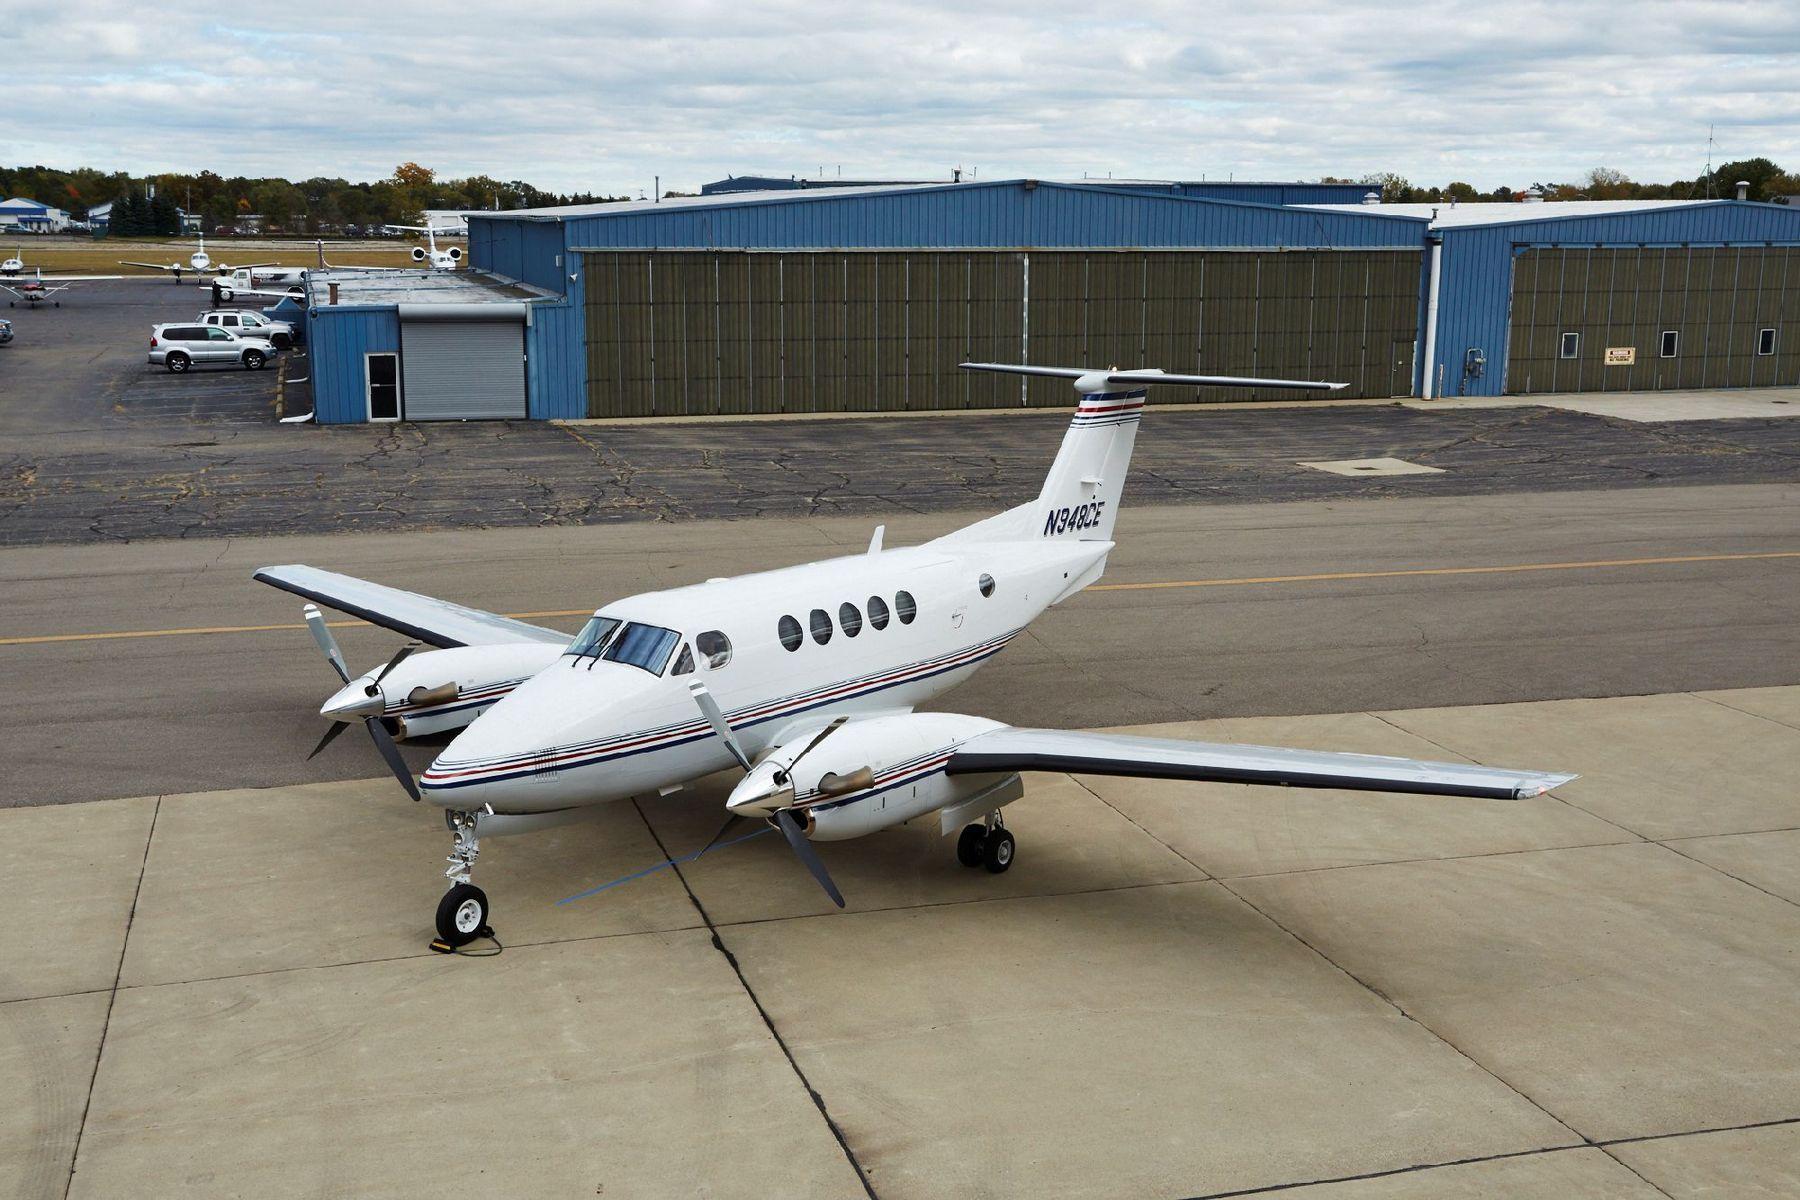 2001 Beechcraft King Air B200 for sale in Pontiac, MI